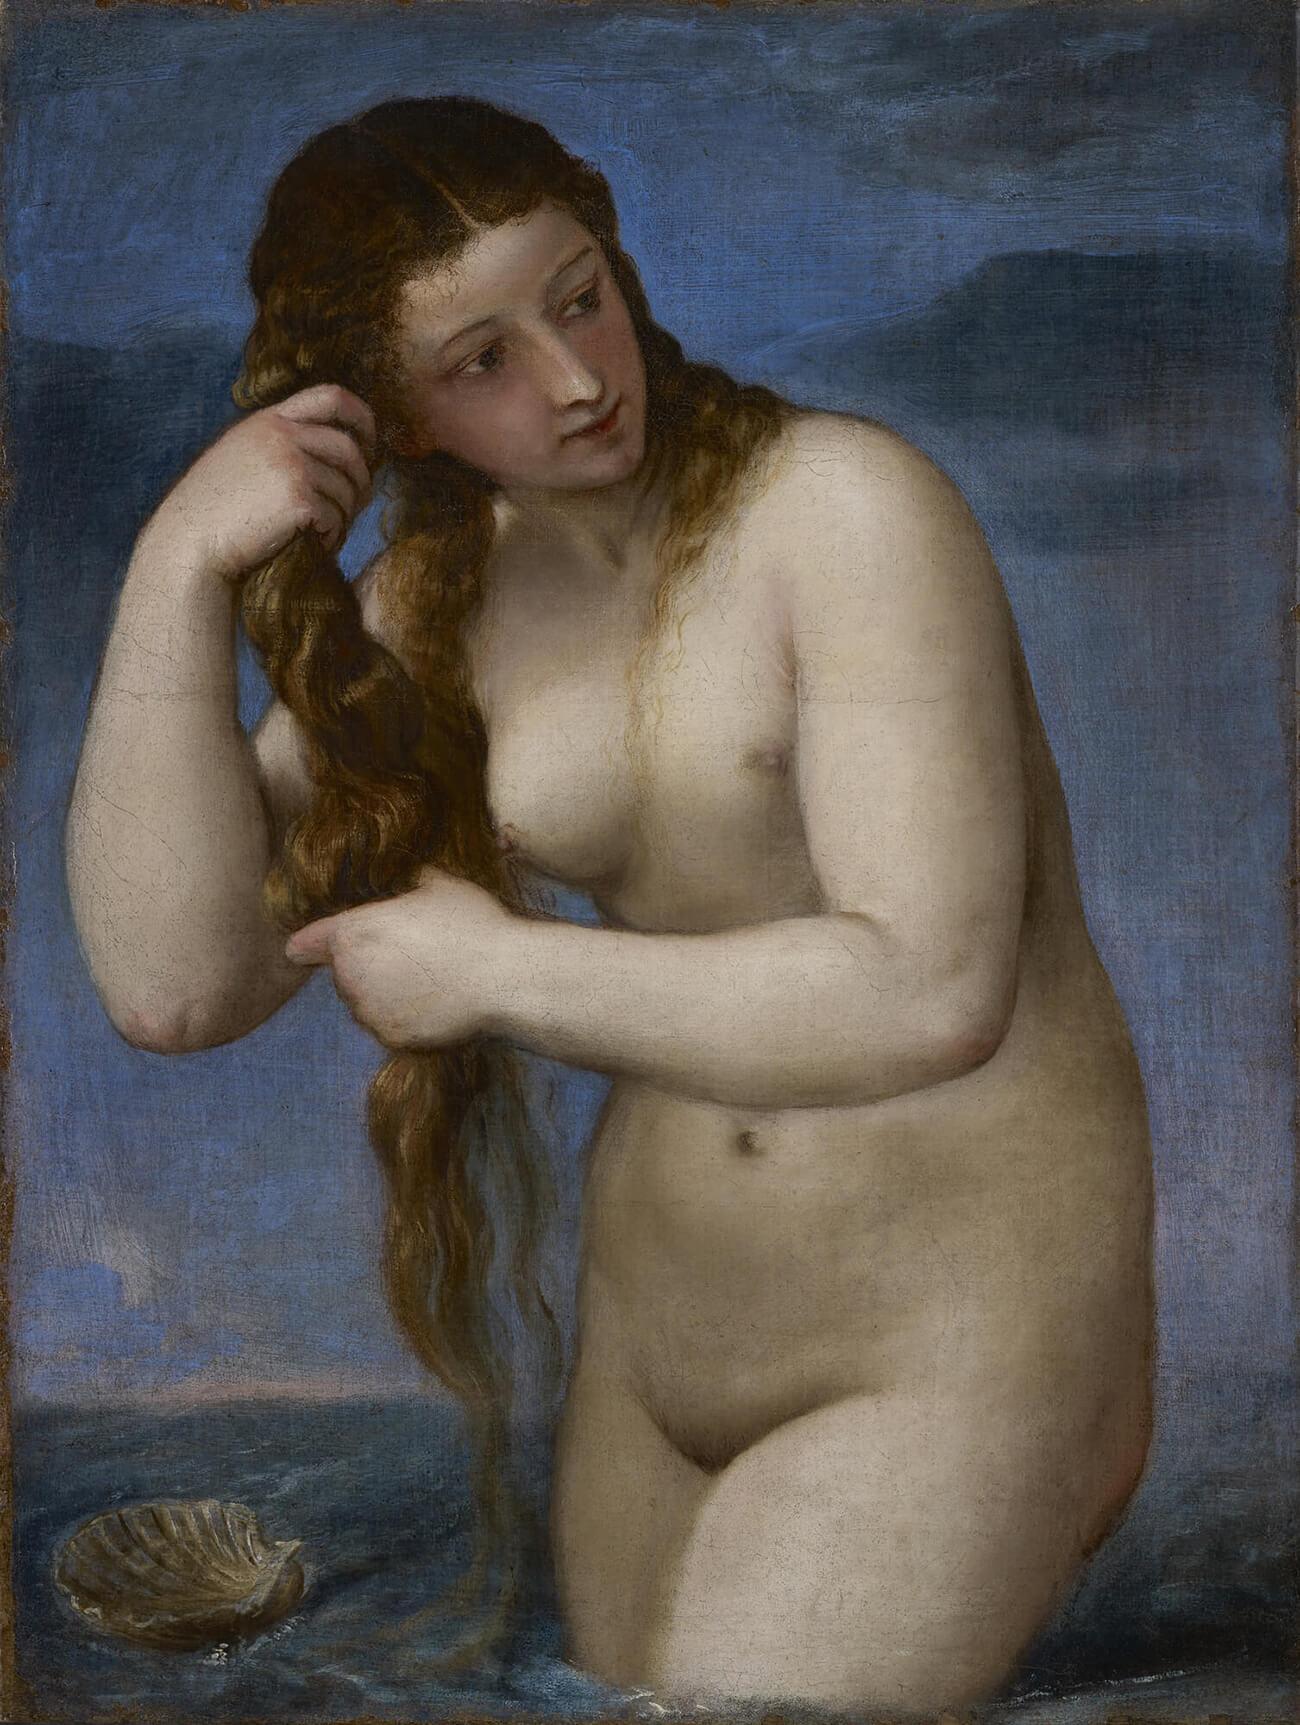 Marissa miller nude and barfoot